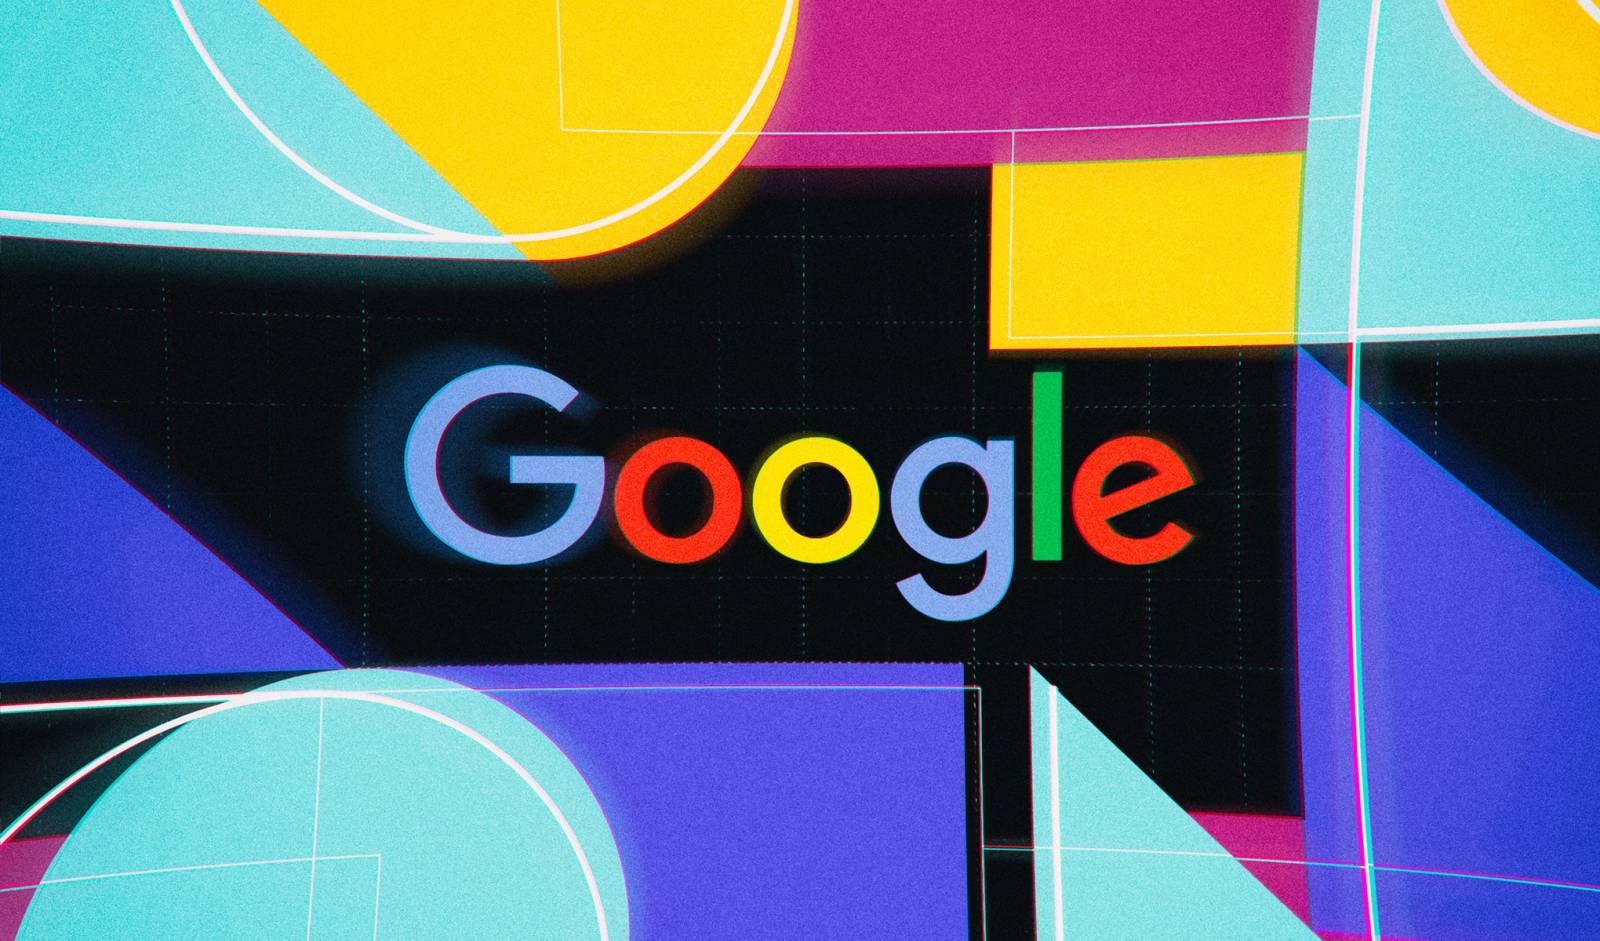 Google exynos